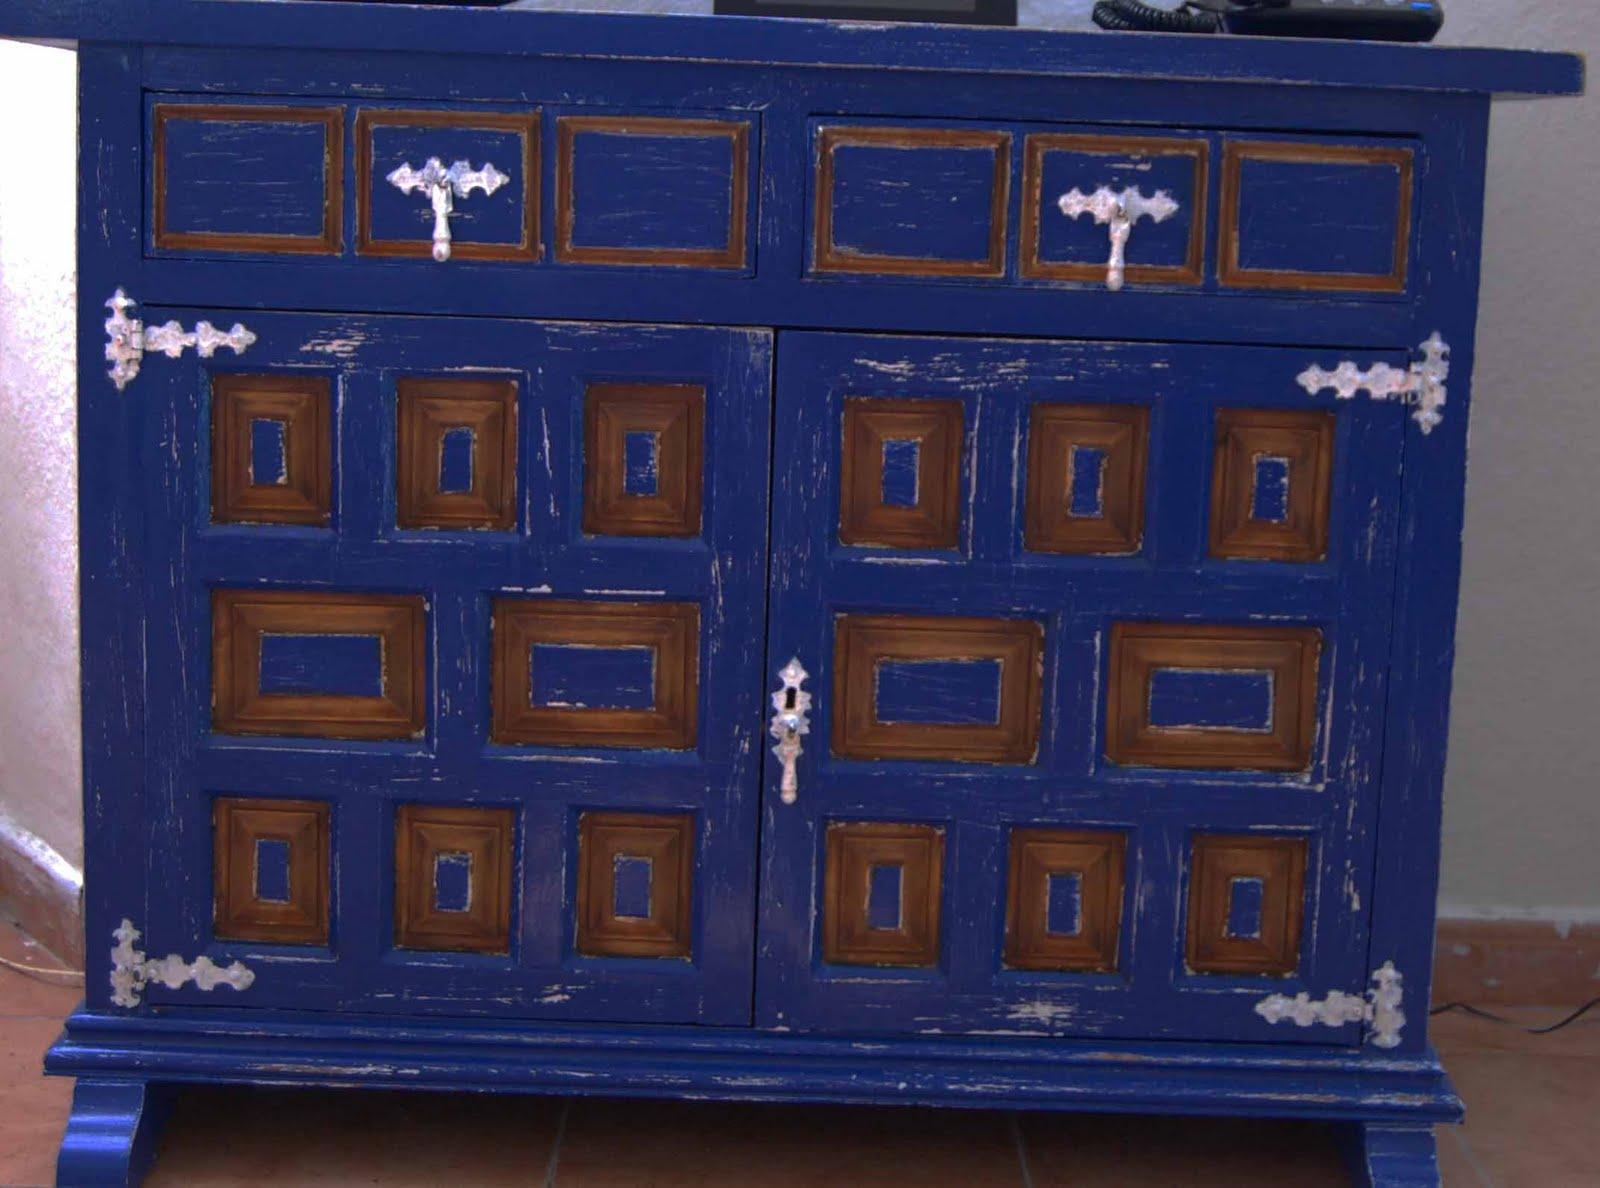 Mueble castellano antiguo mueble castellano antigedades - Modernizar muebles antiguos ...